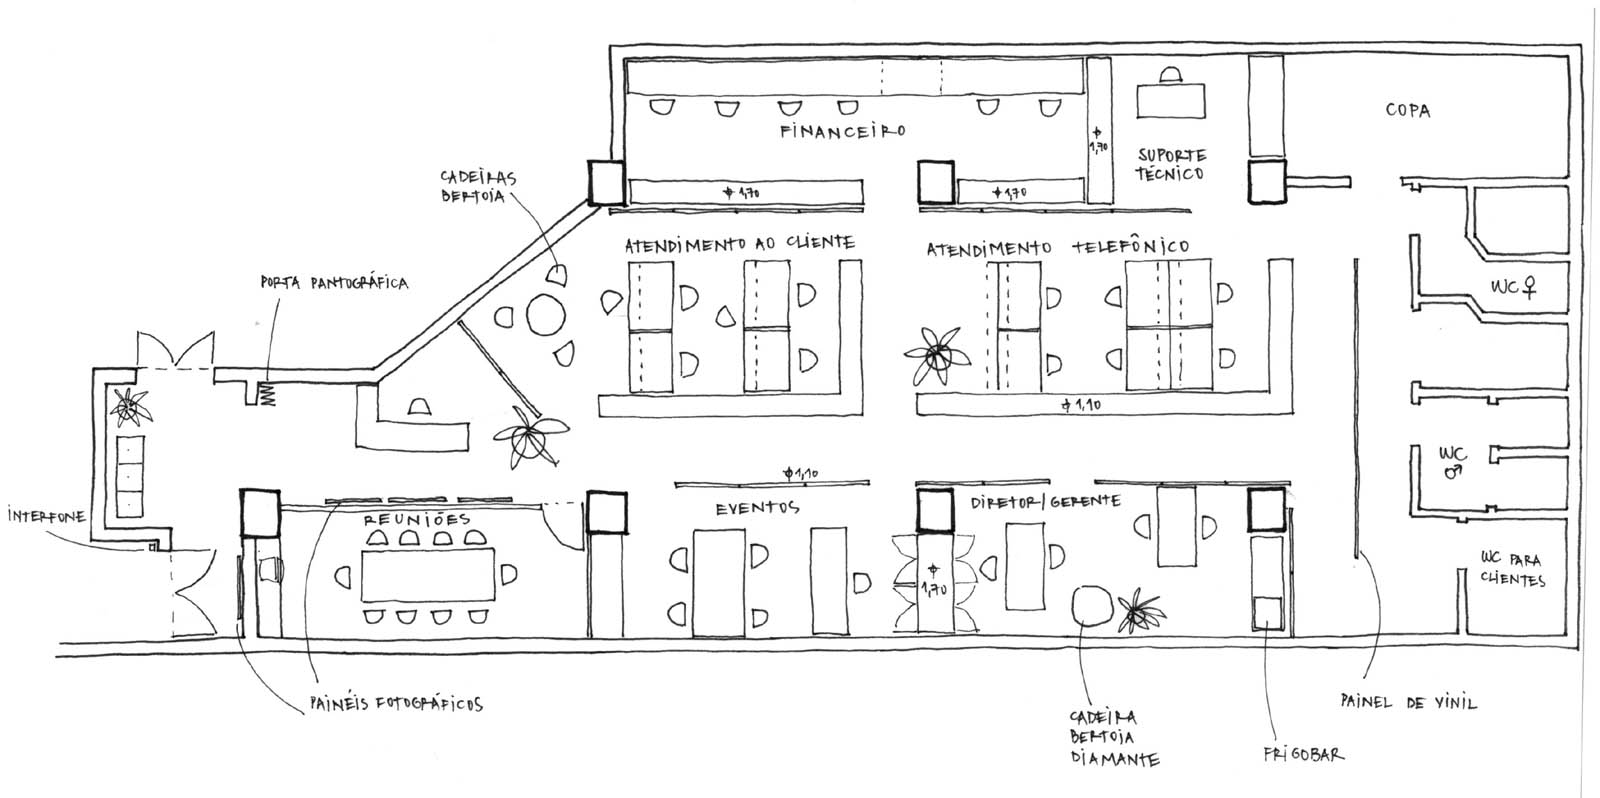 Projeto Design De Mobiliario E Execucao De Banheiro Parte De Suite De  #404040 1600 798